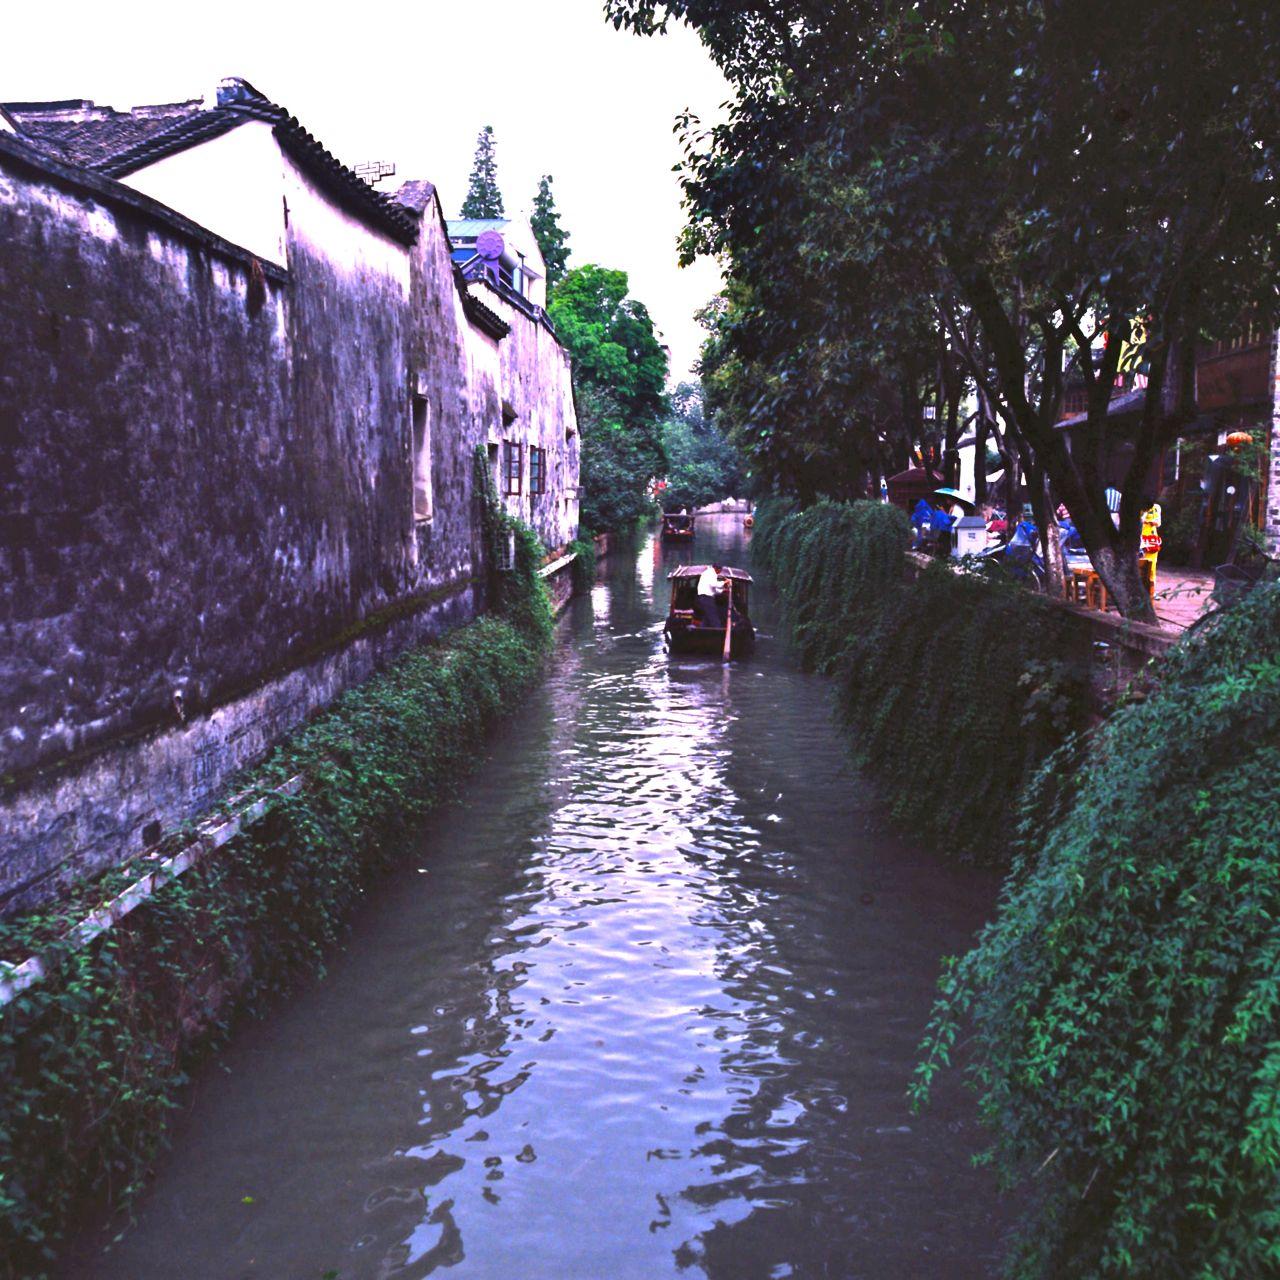 蘇州 / Suzhou, China, July 2014